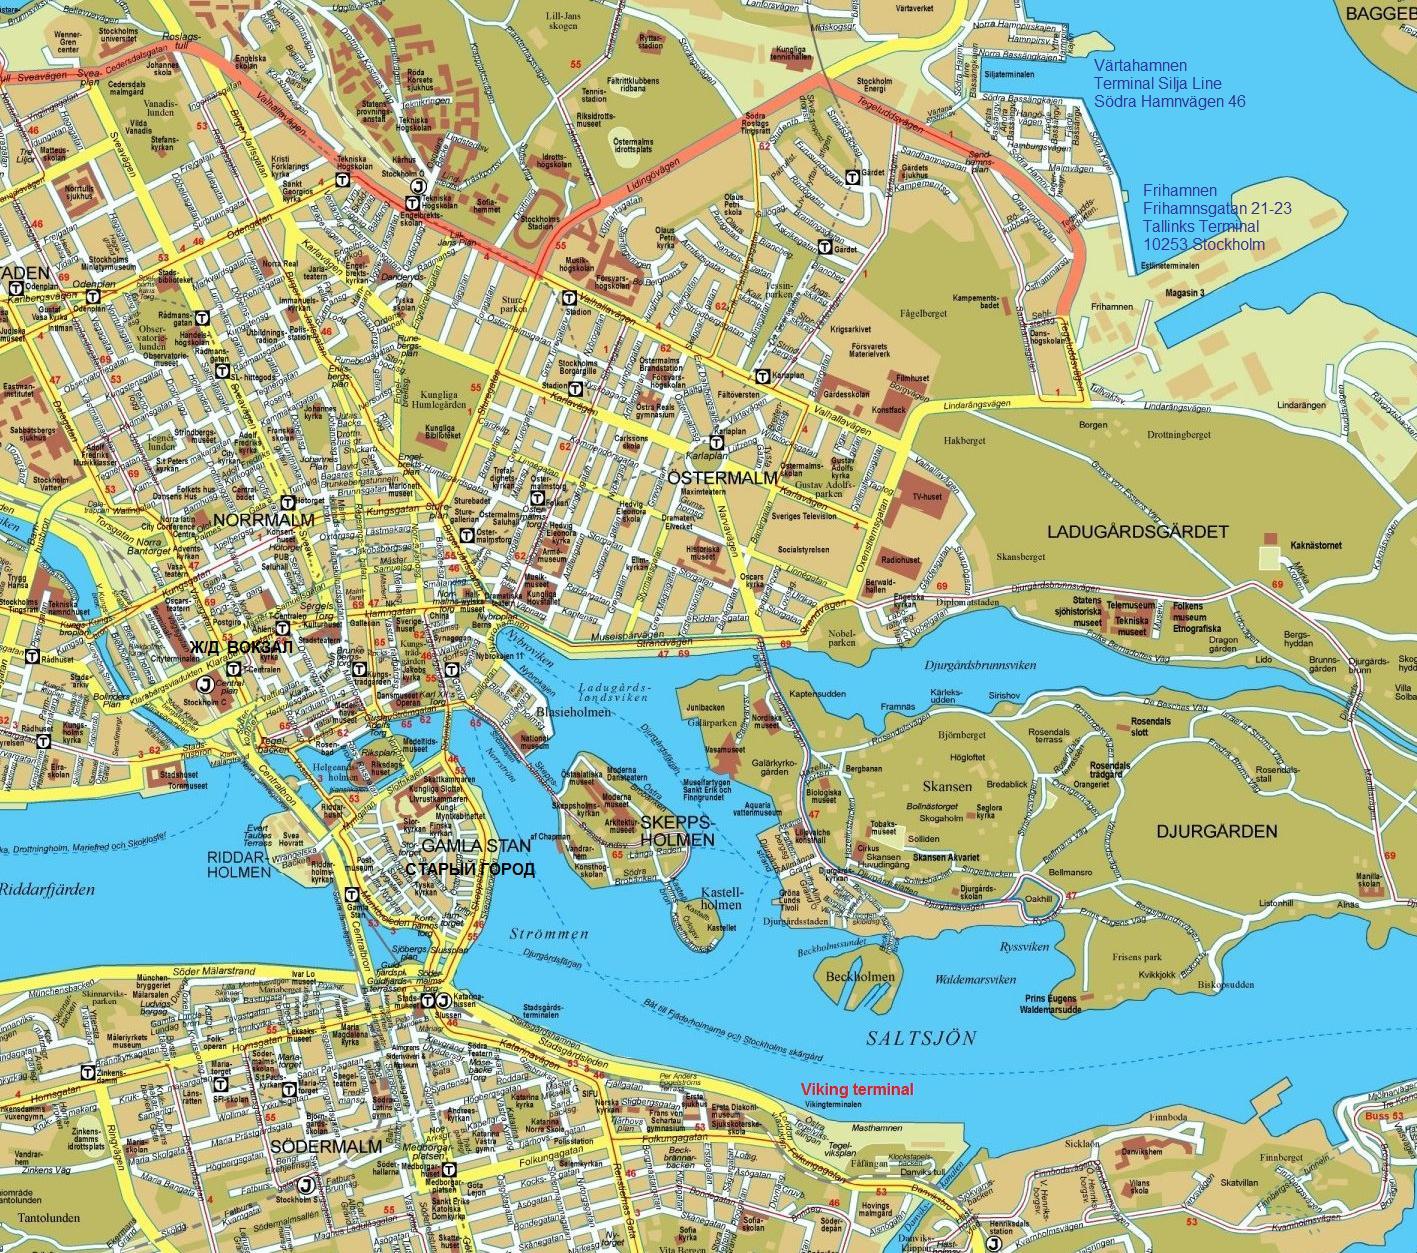 Карта Стокгольма с обозначением терминалов Tallink, Silja Line, Viking Line. Stockholm map. www.NaParome.ru